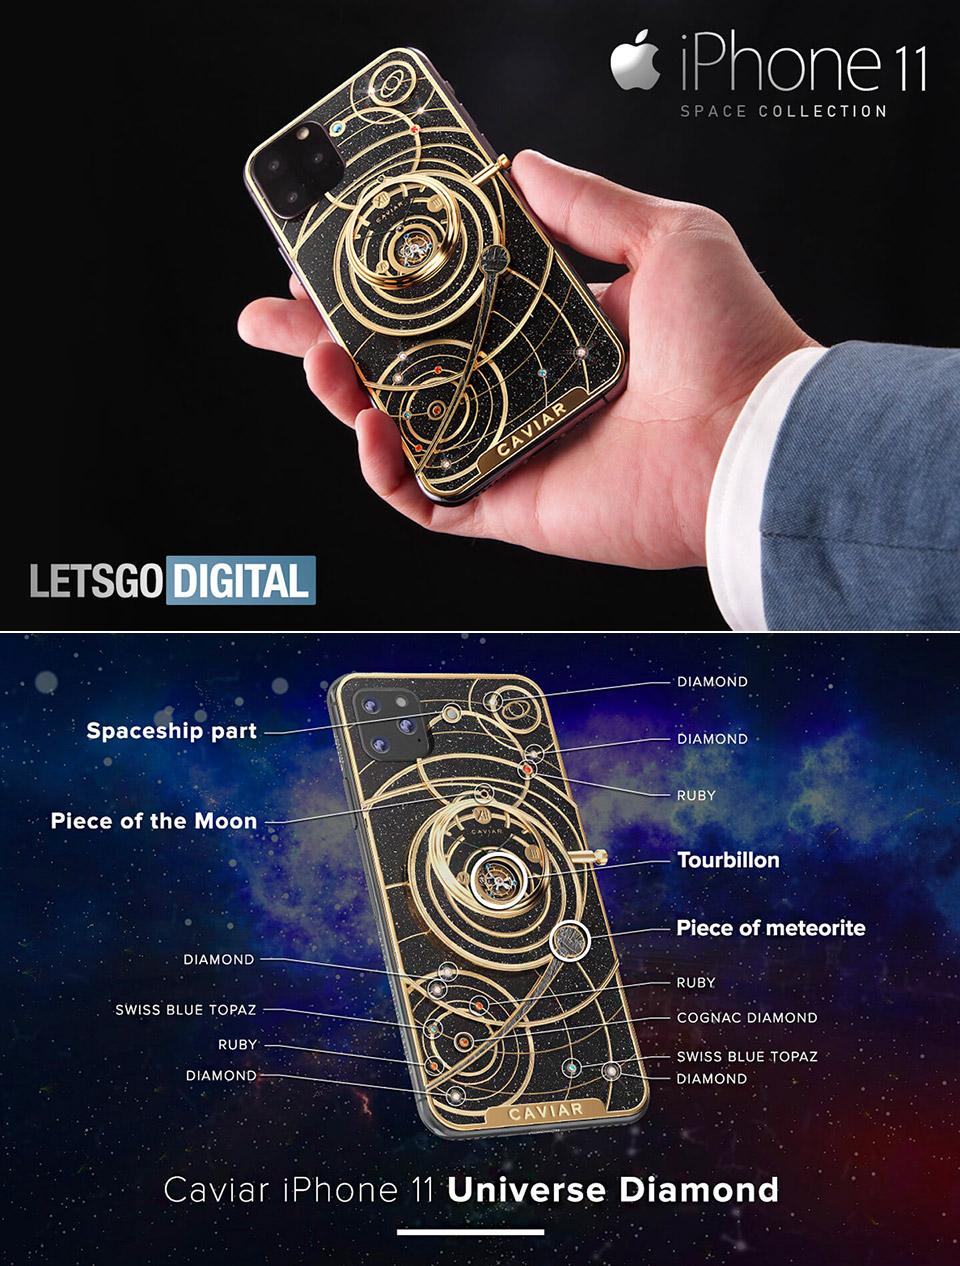 Caviar iPhone 11 Universe Diamond